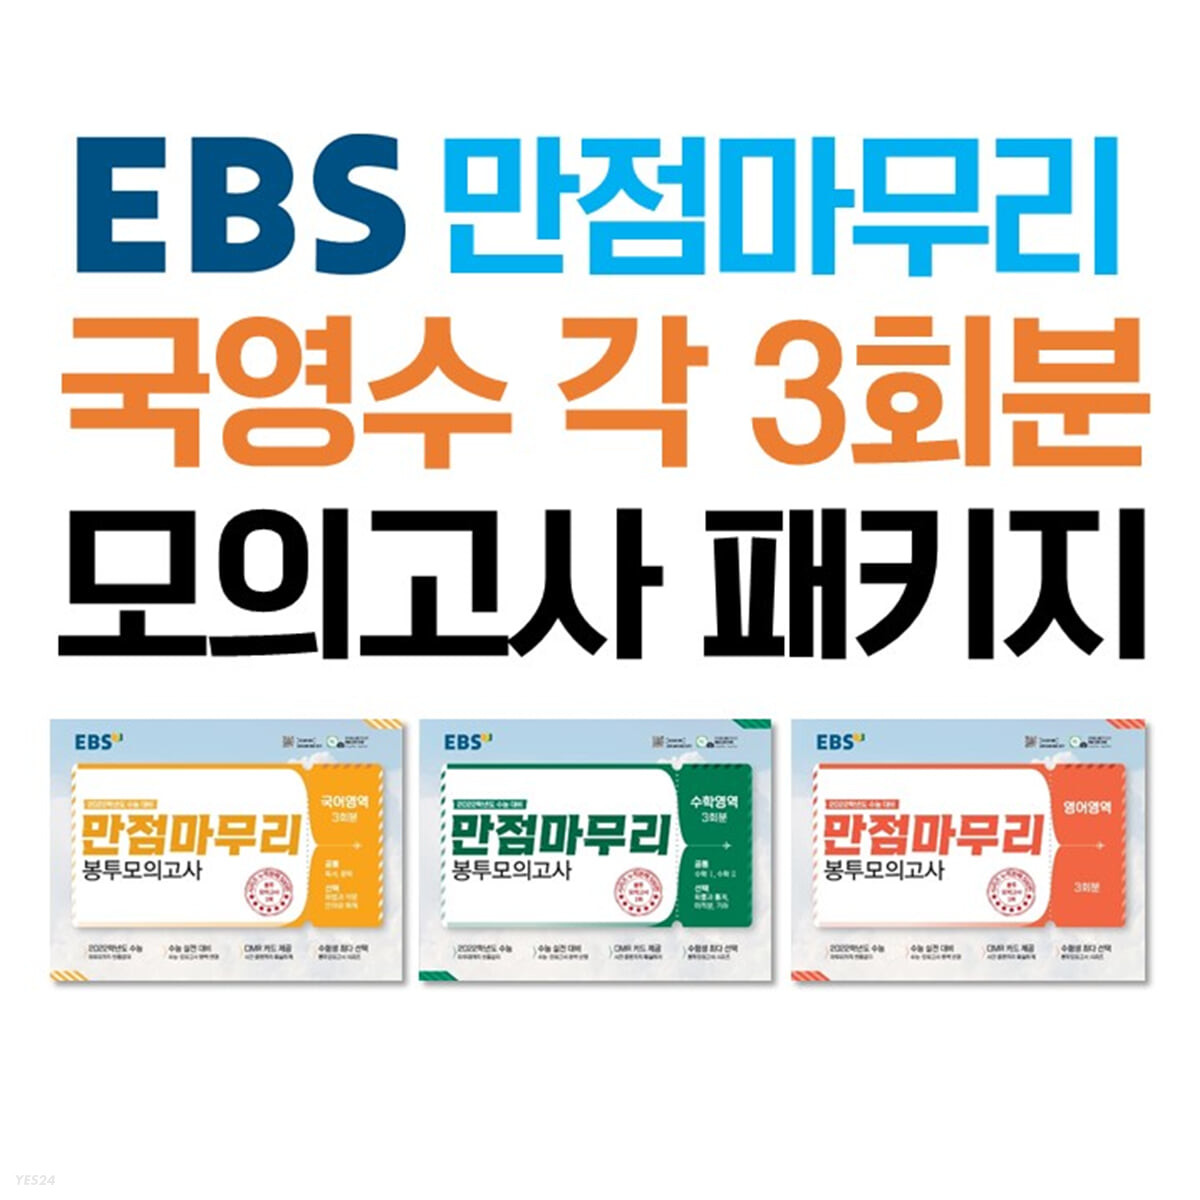 EBS 만점마무리 국영수 각 3회분 모의고사 패키지